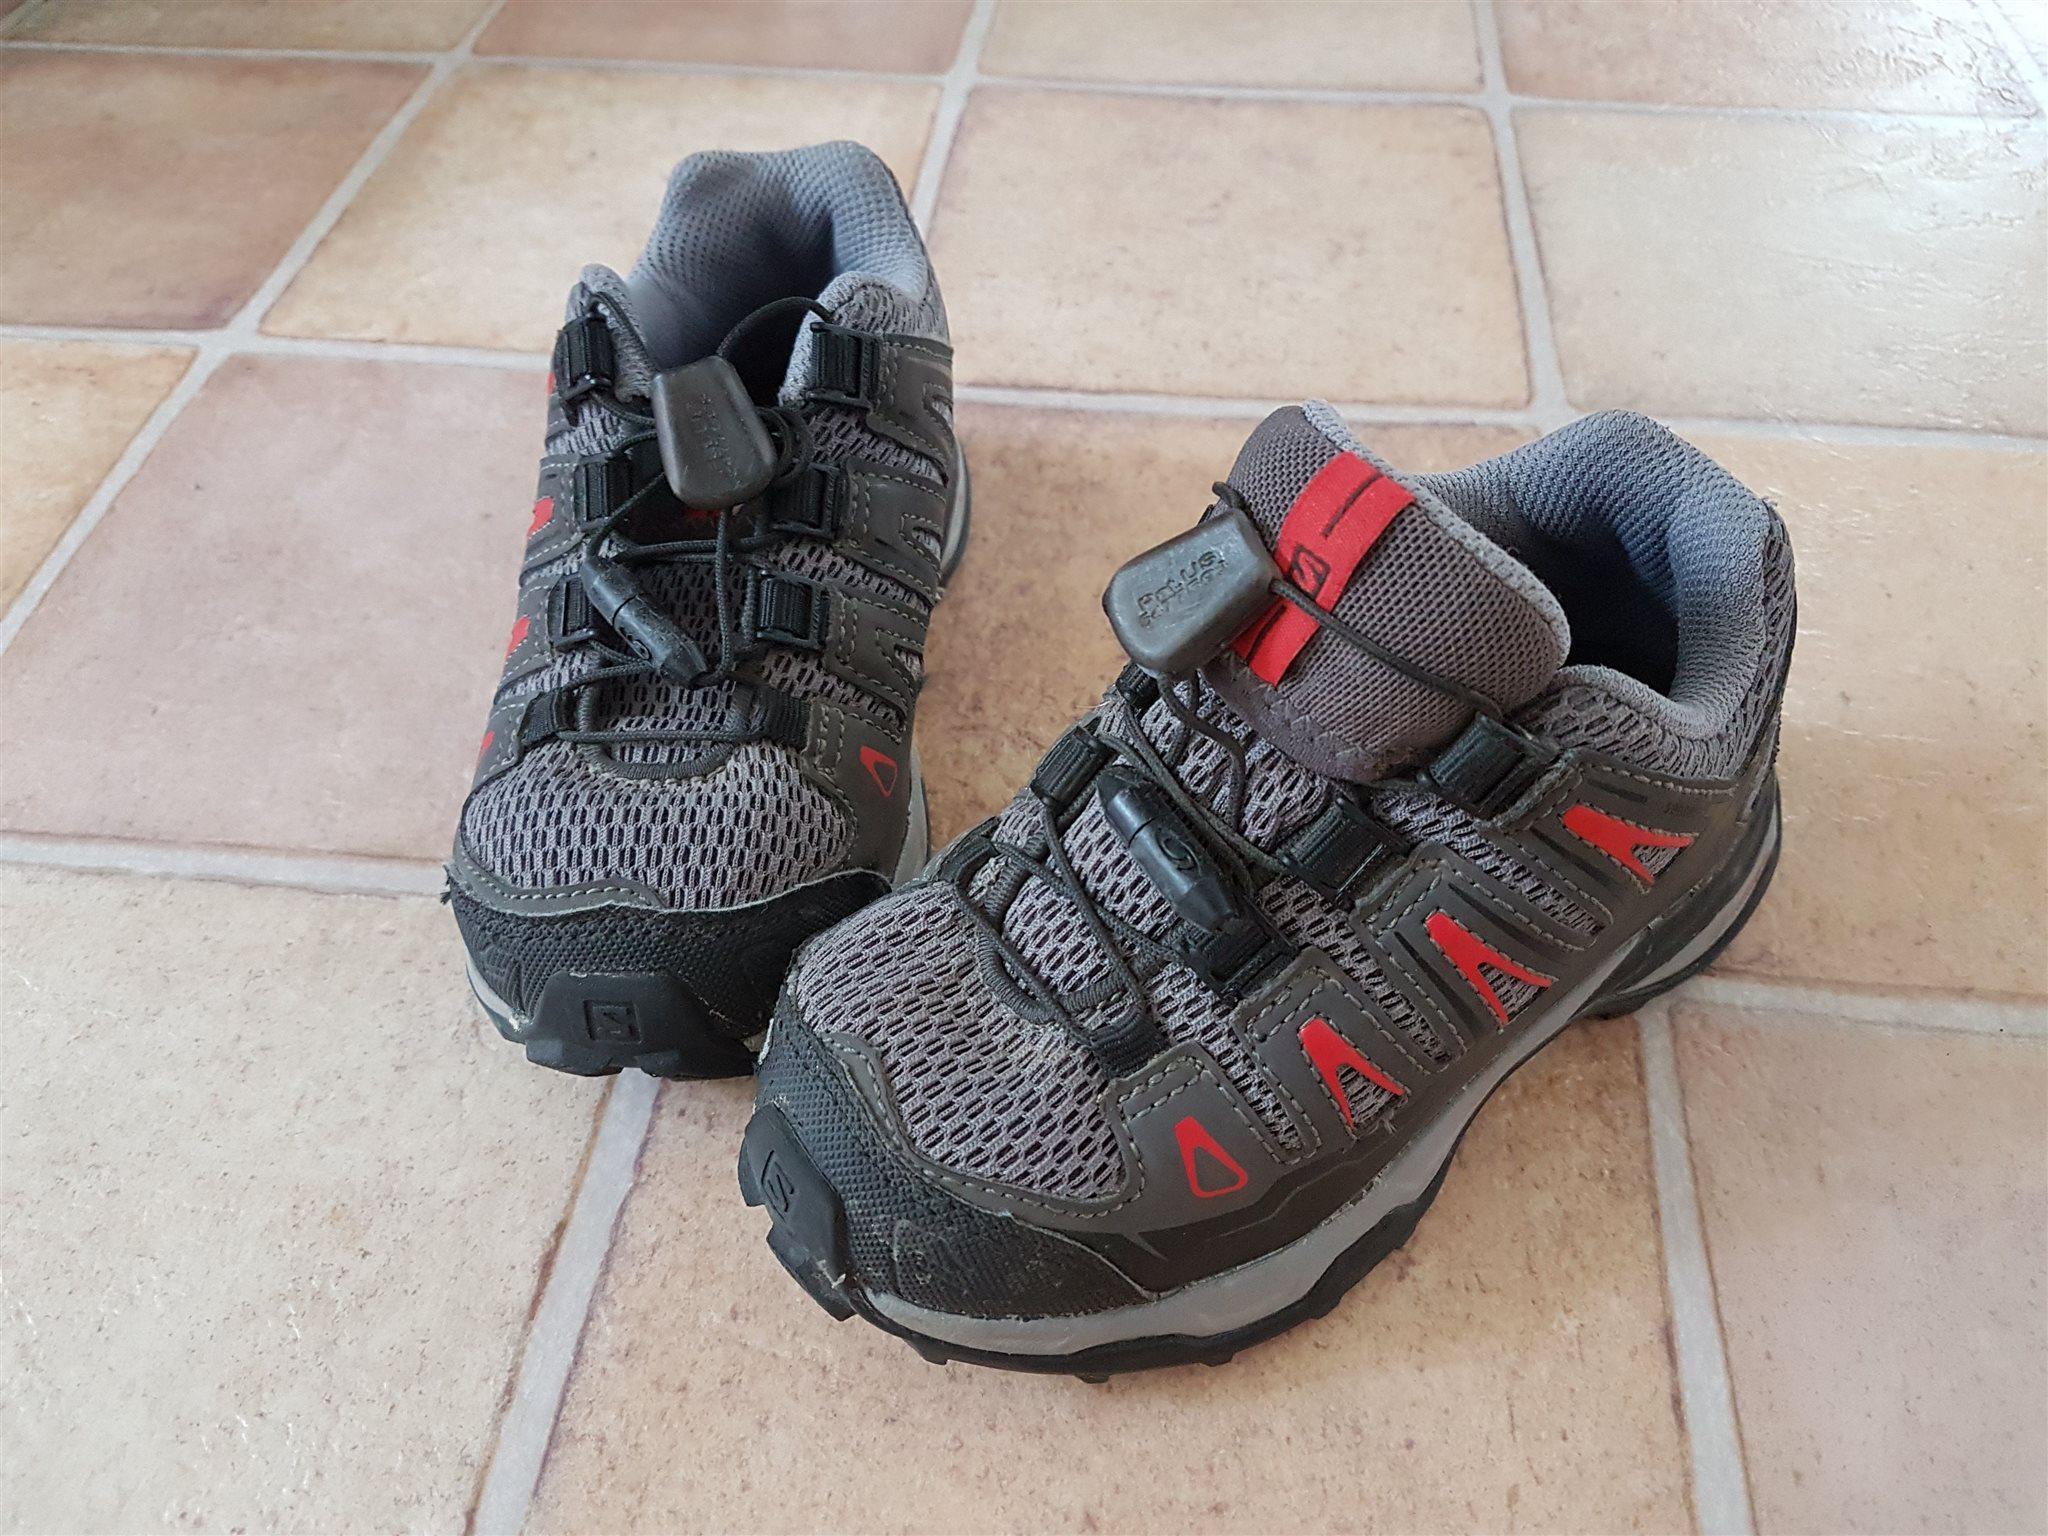 low priced d6177 92030 Utskrivet 2018-10-27. adidas Herr Originals adidas STLT Skor NMD Sneakers  R1 Svarta ...